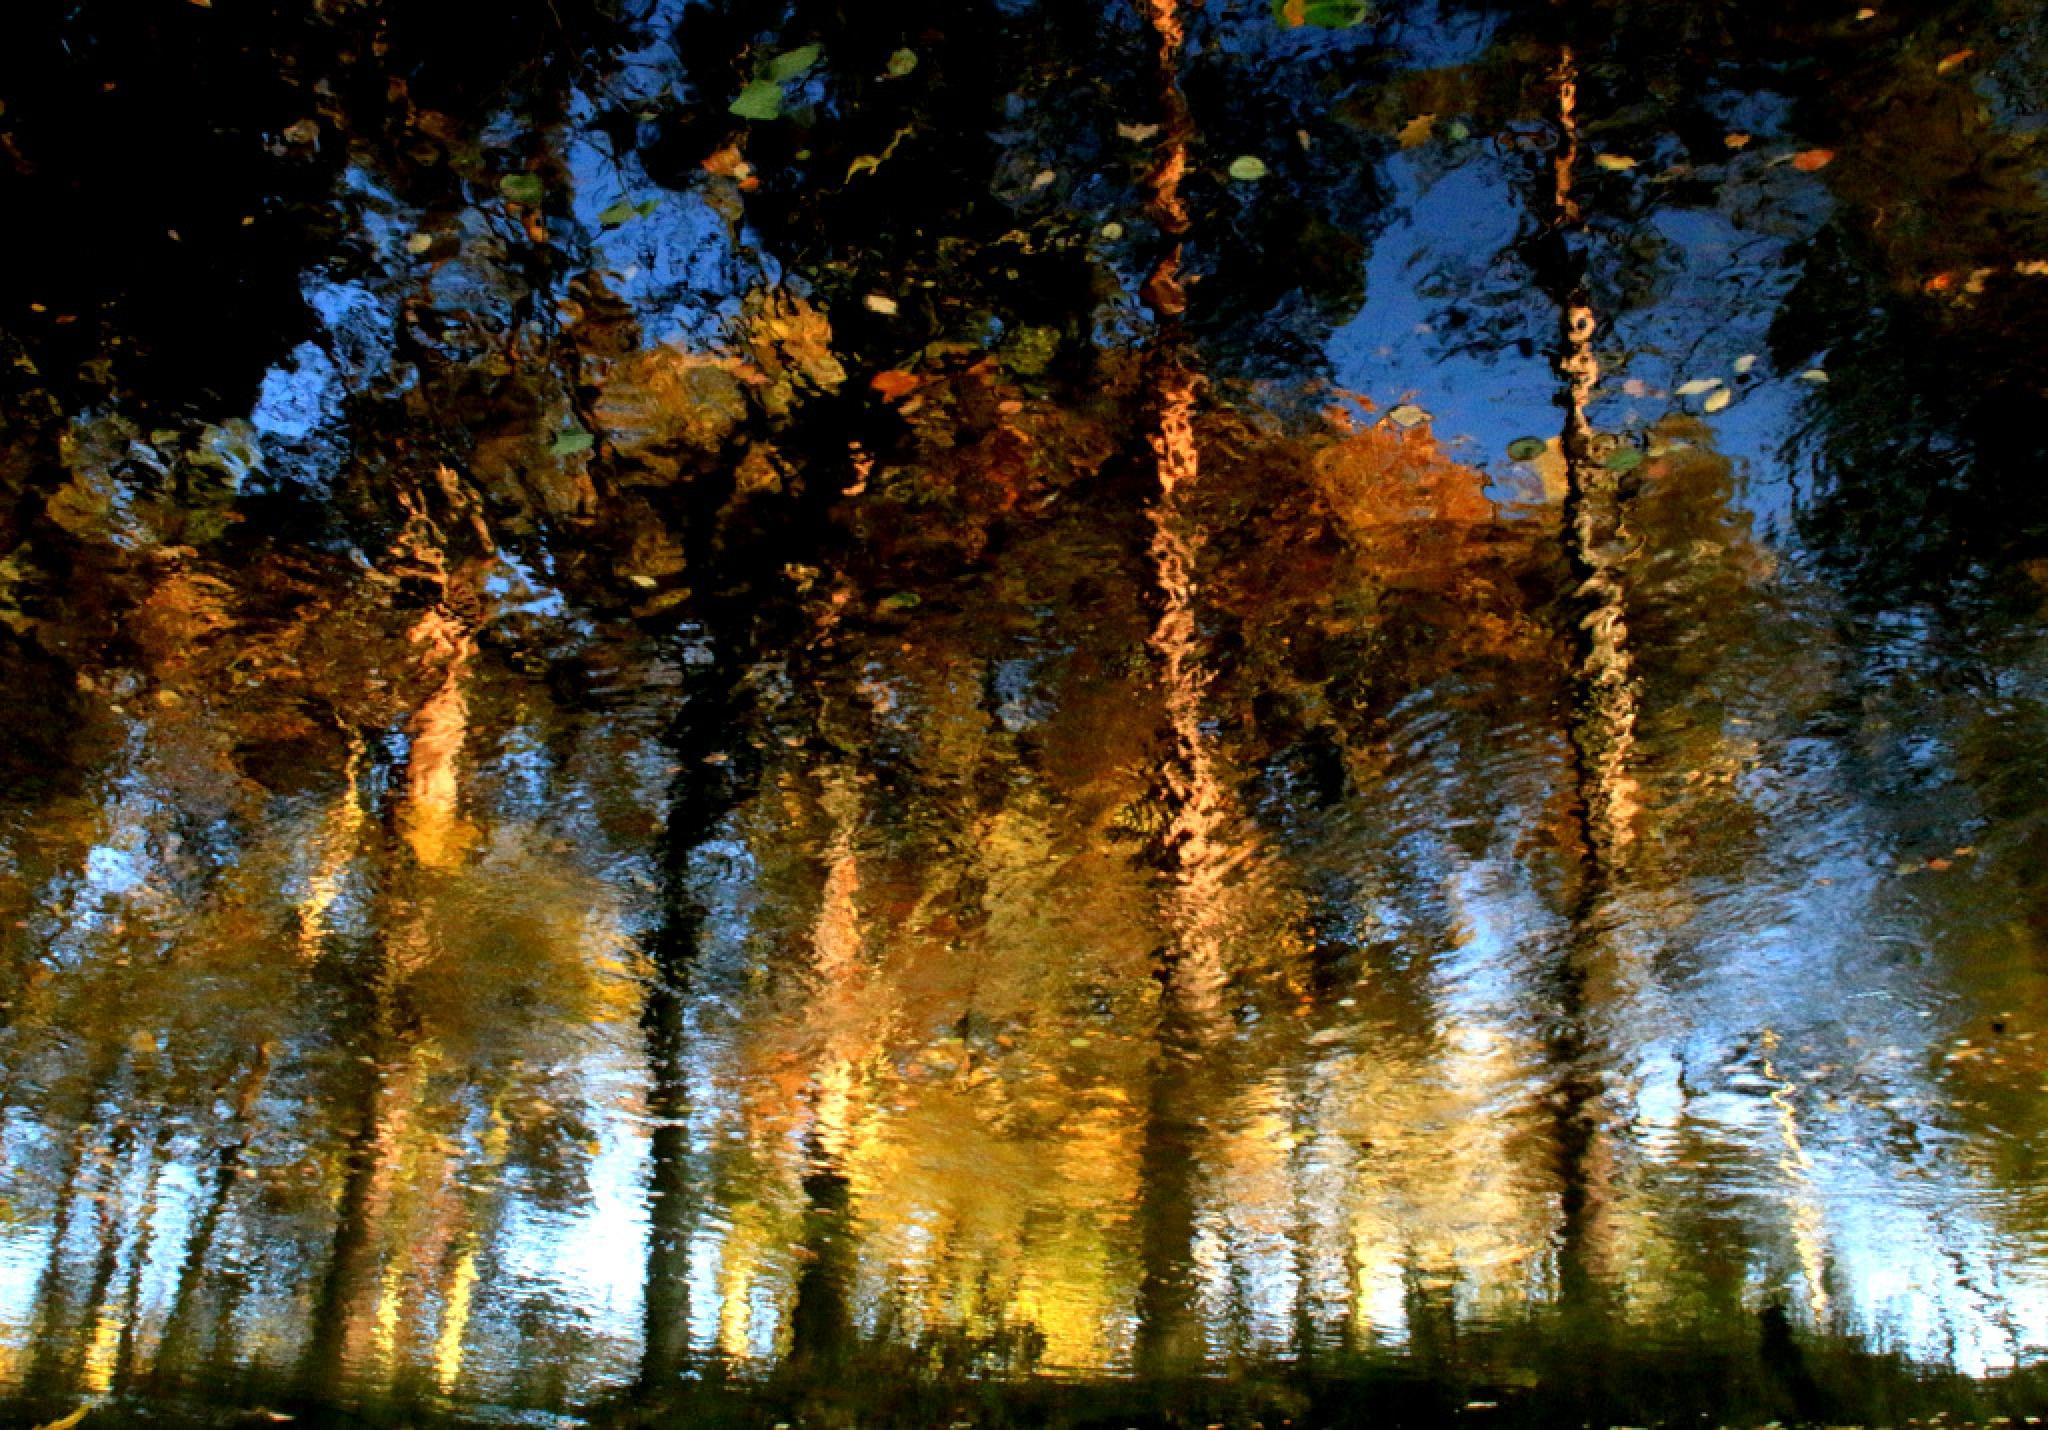 Photoimpressionism by JAKOKTO PAUKAS